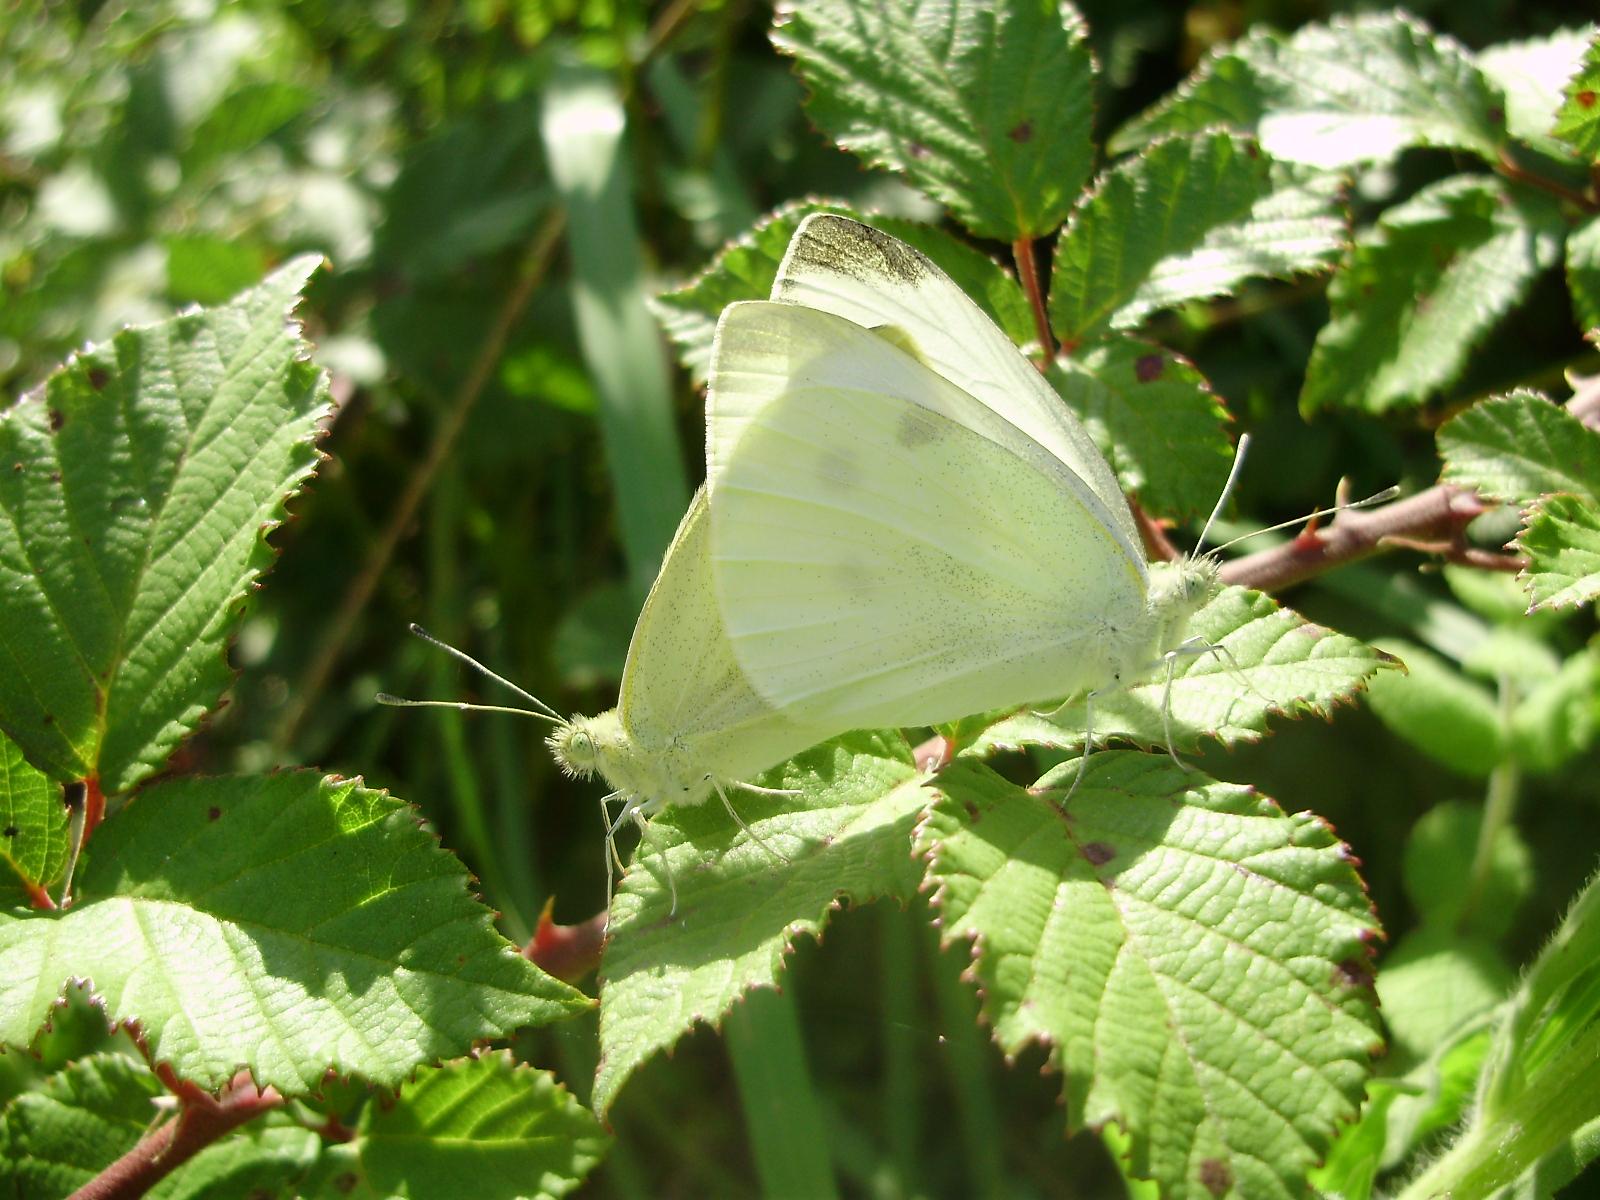 Pareja de mariposas Pieris rapae en copula